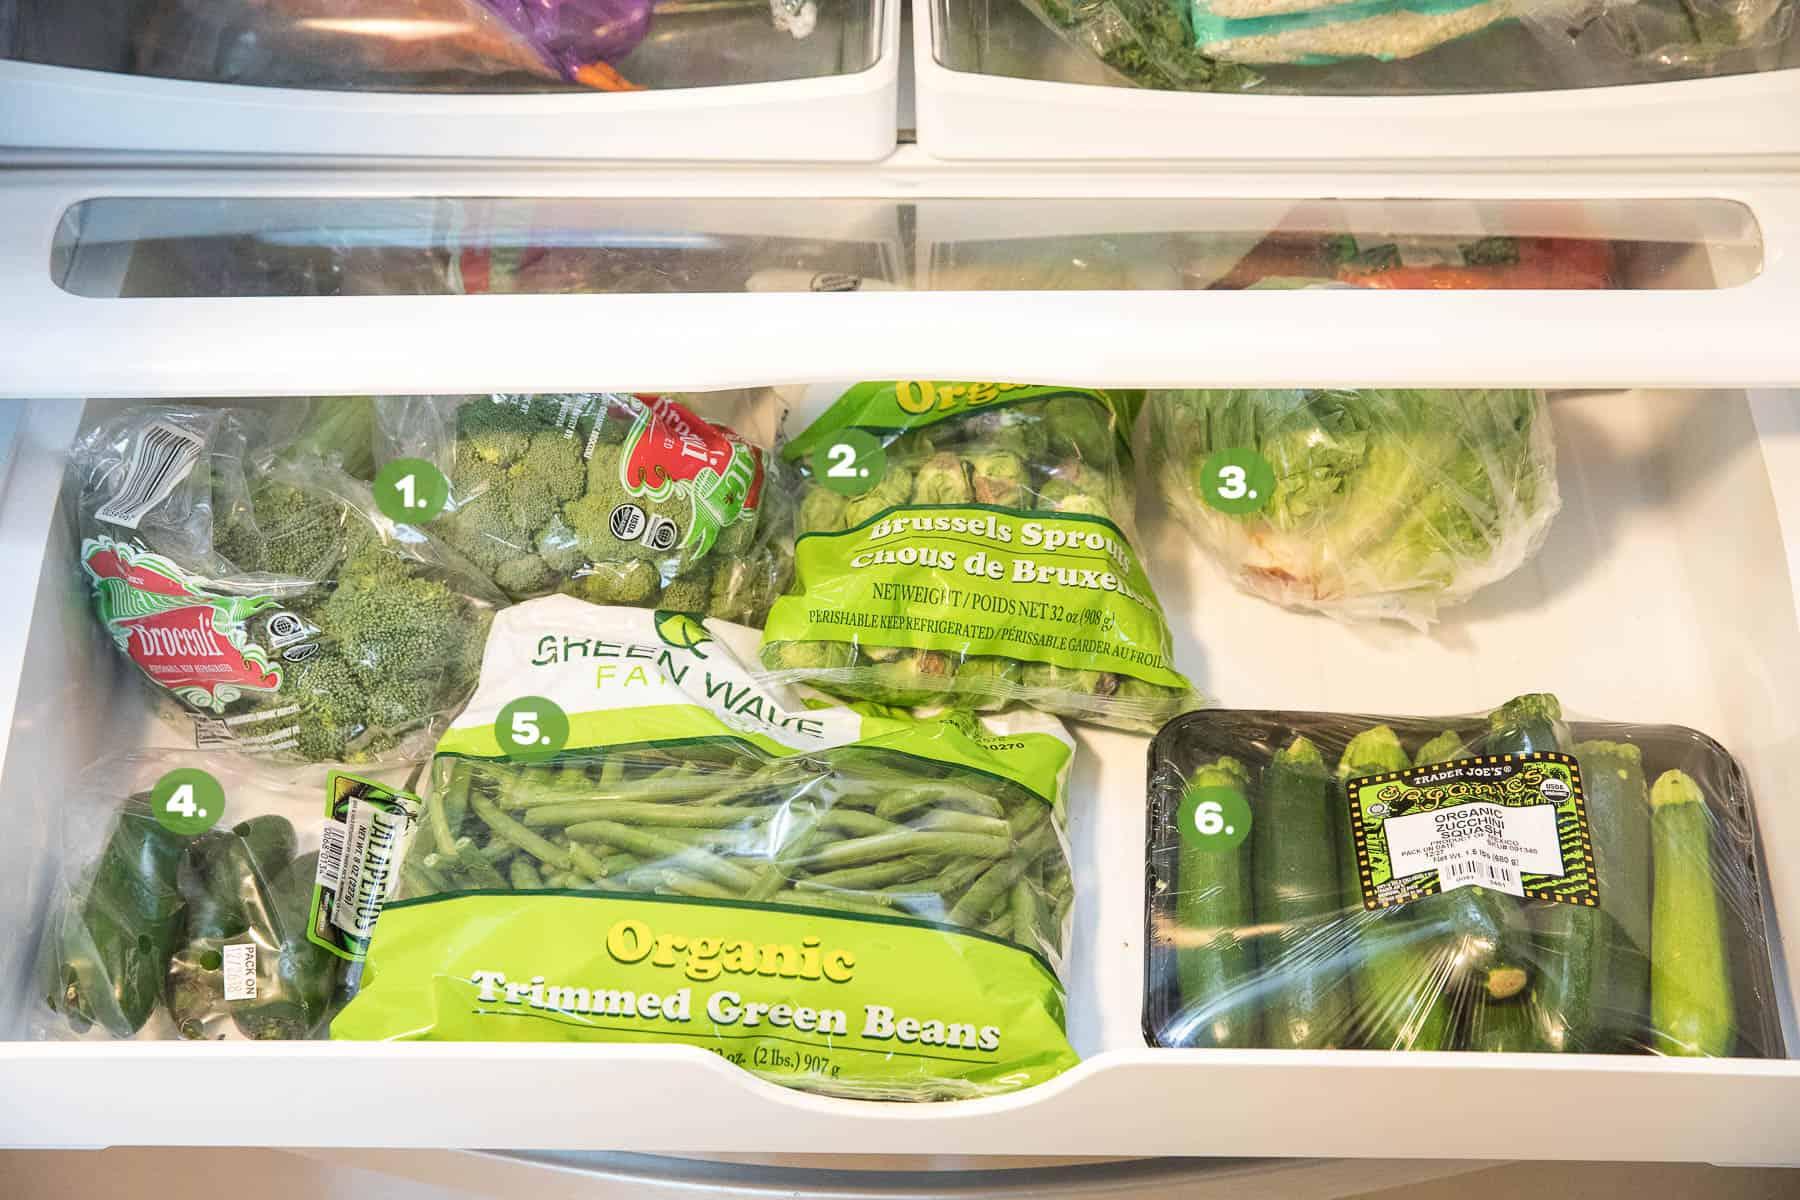 a whole30 stocked refrigerator